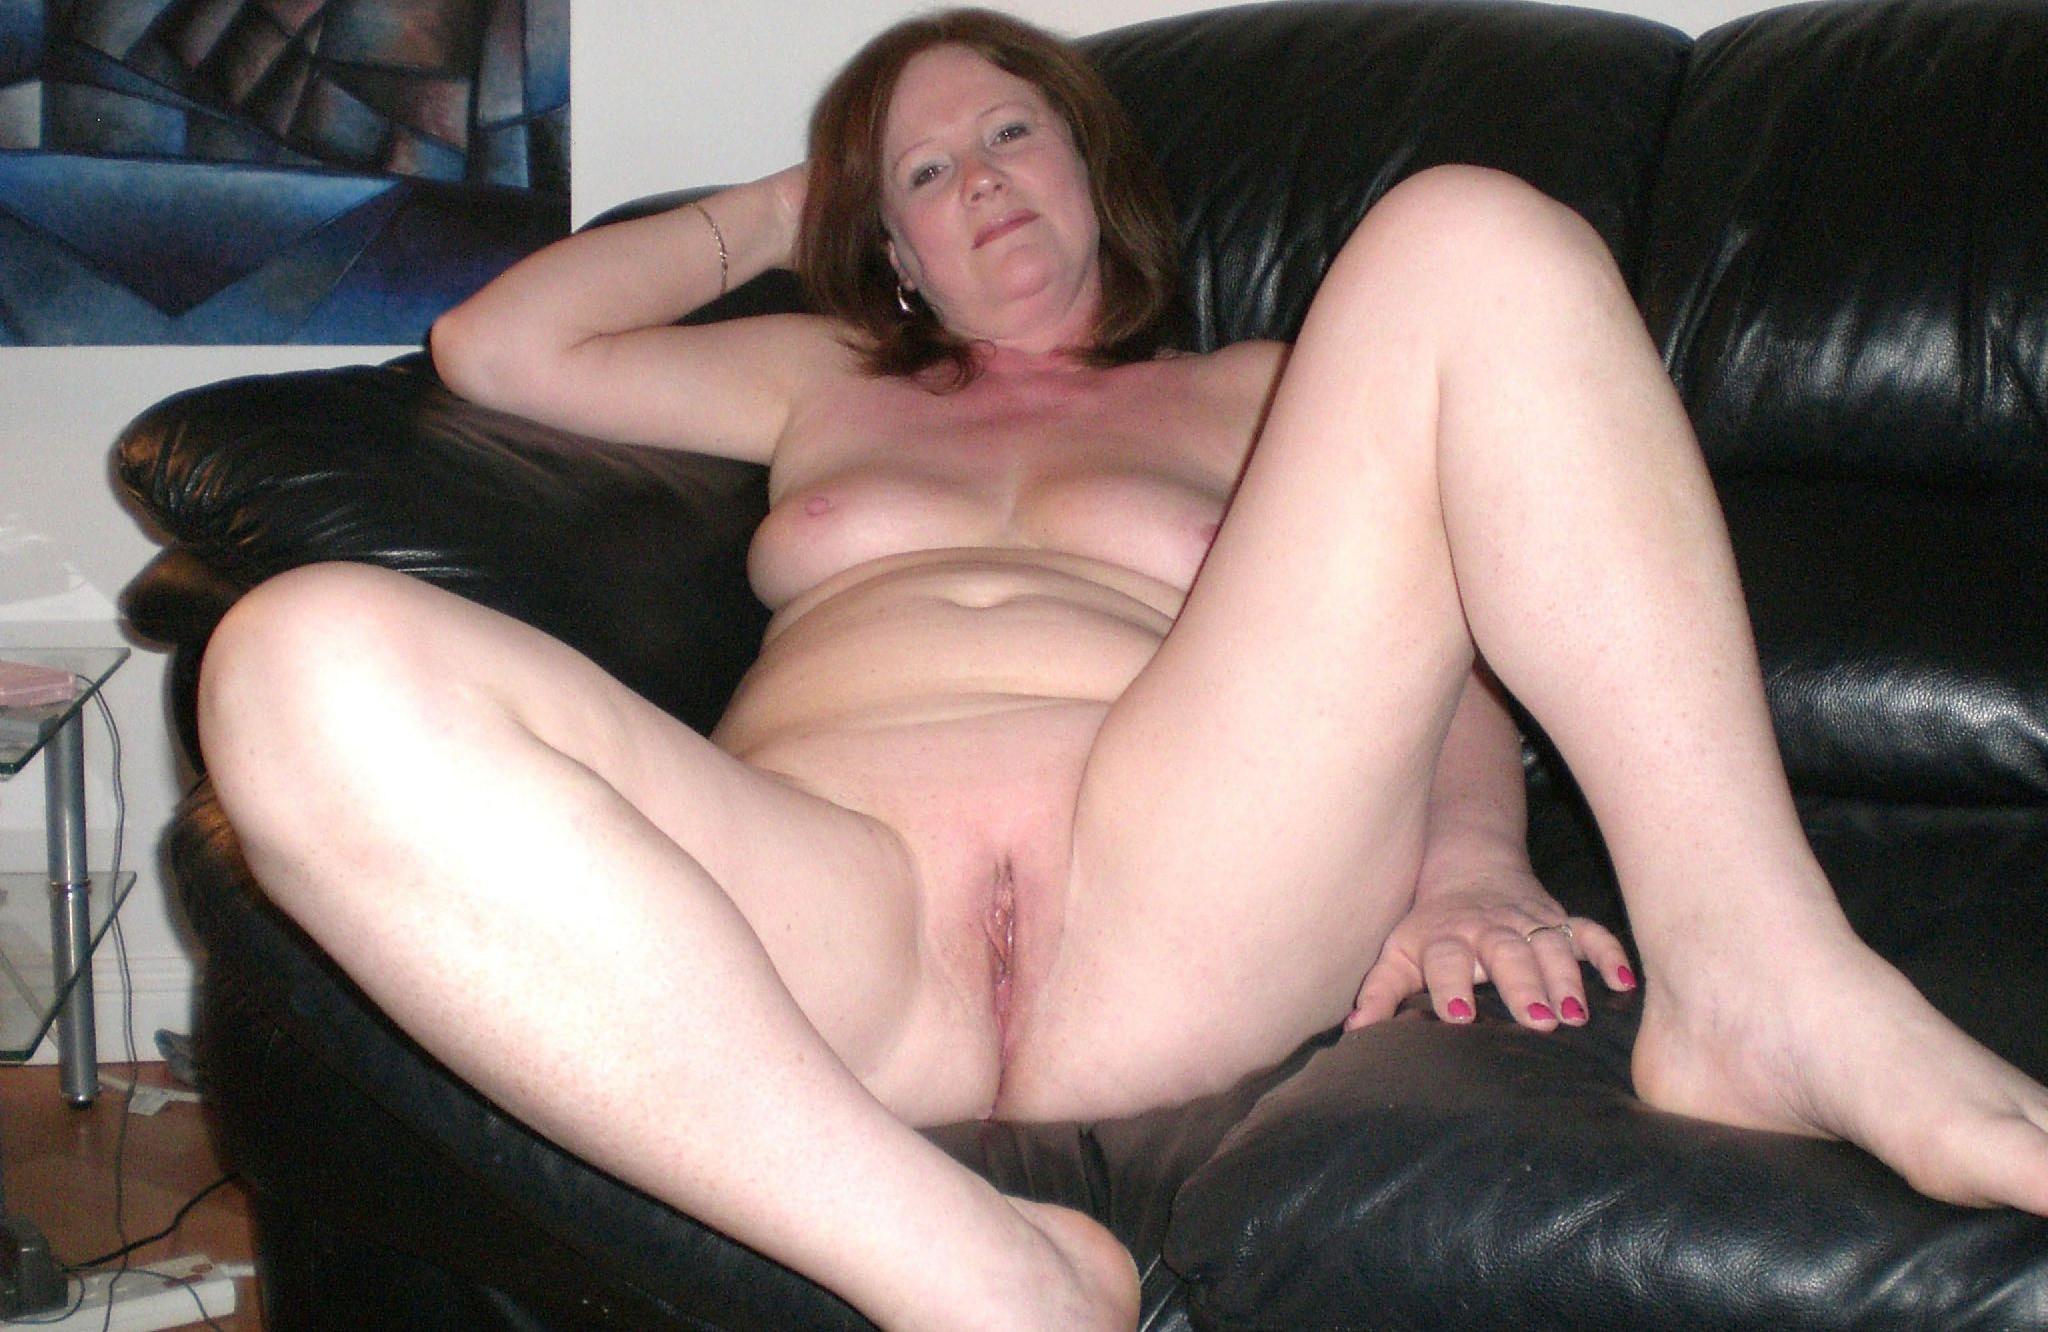 Amateur Mature Get Naked - Free porn Casting pics